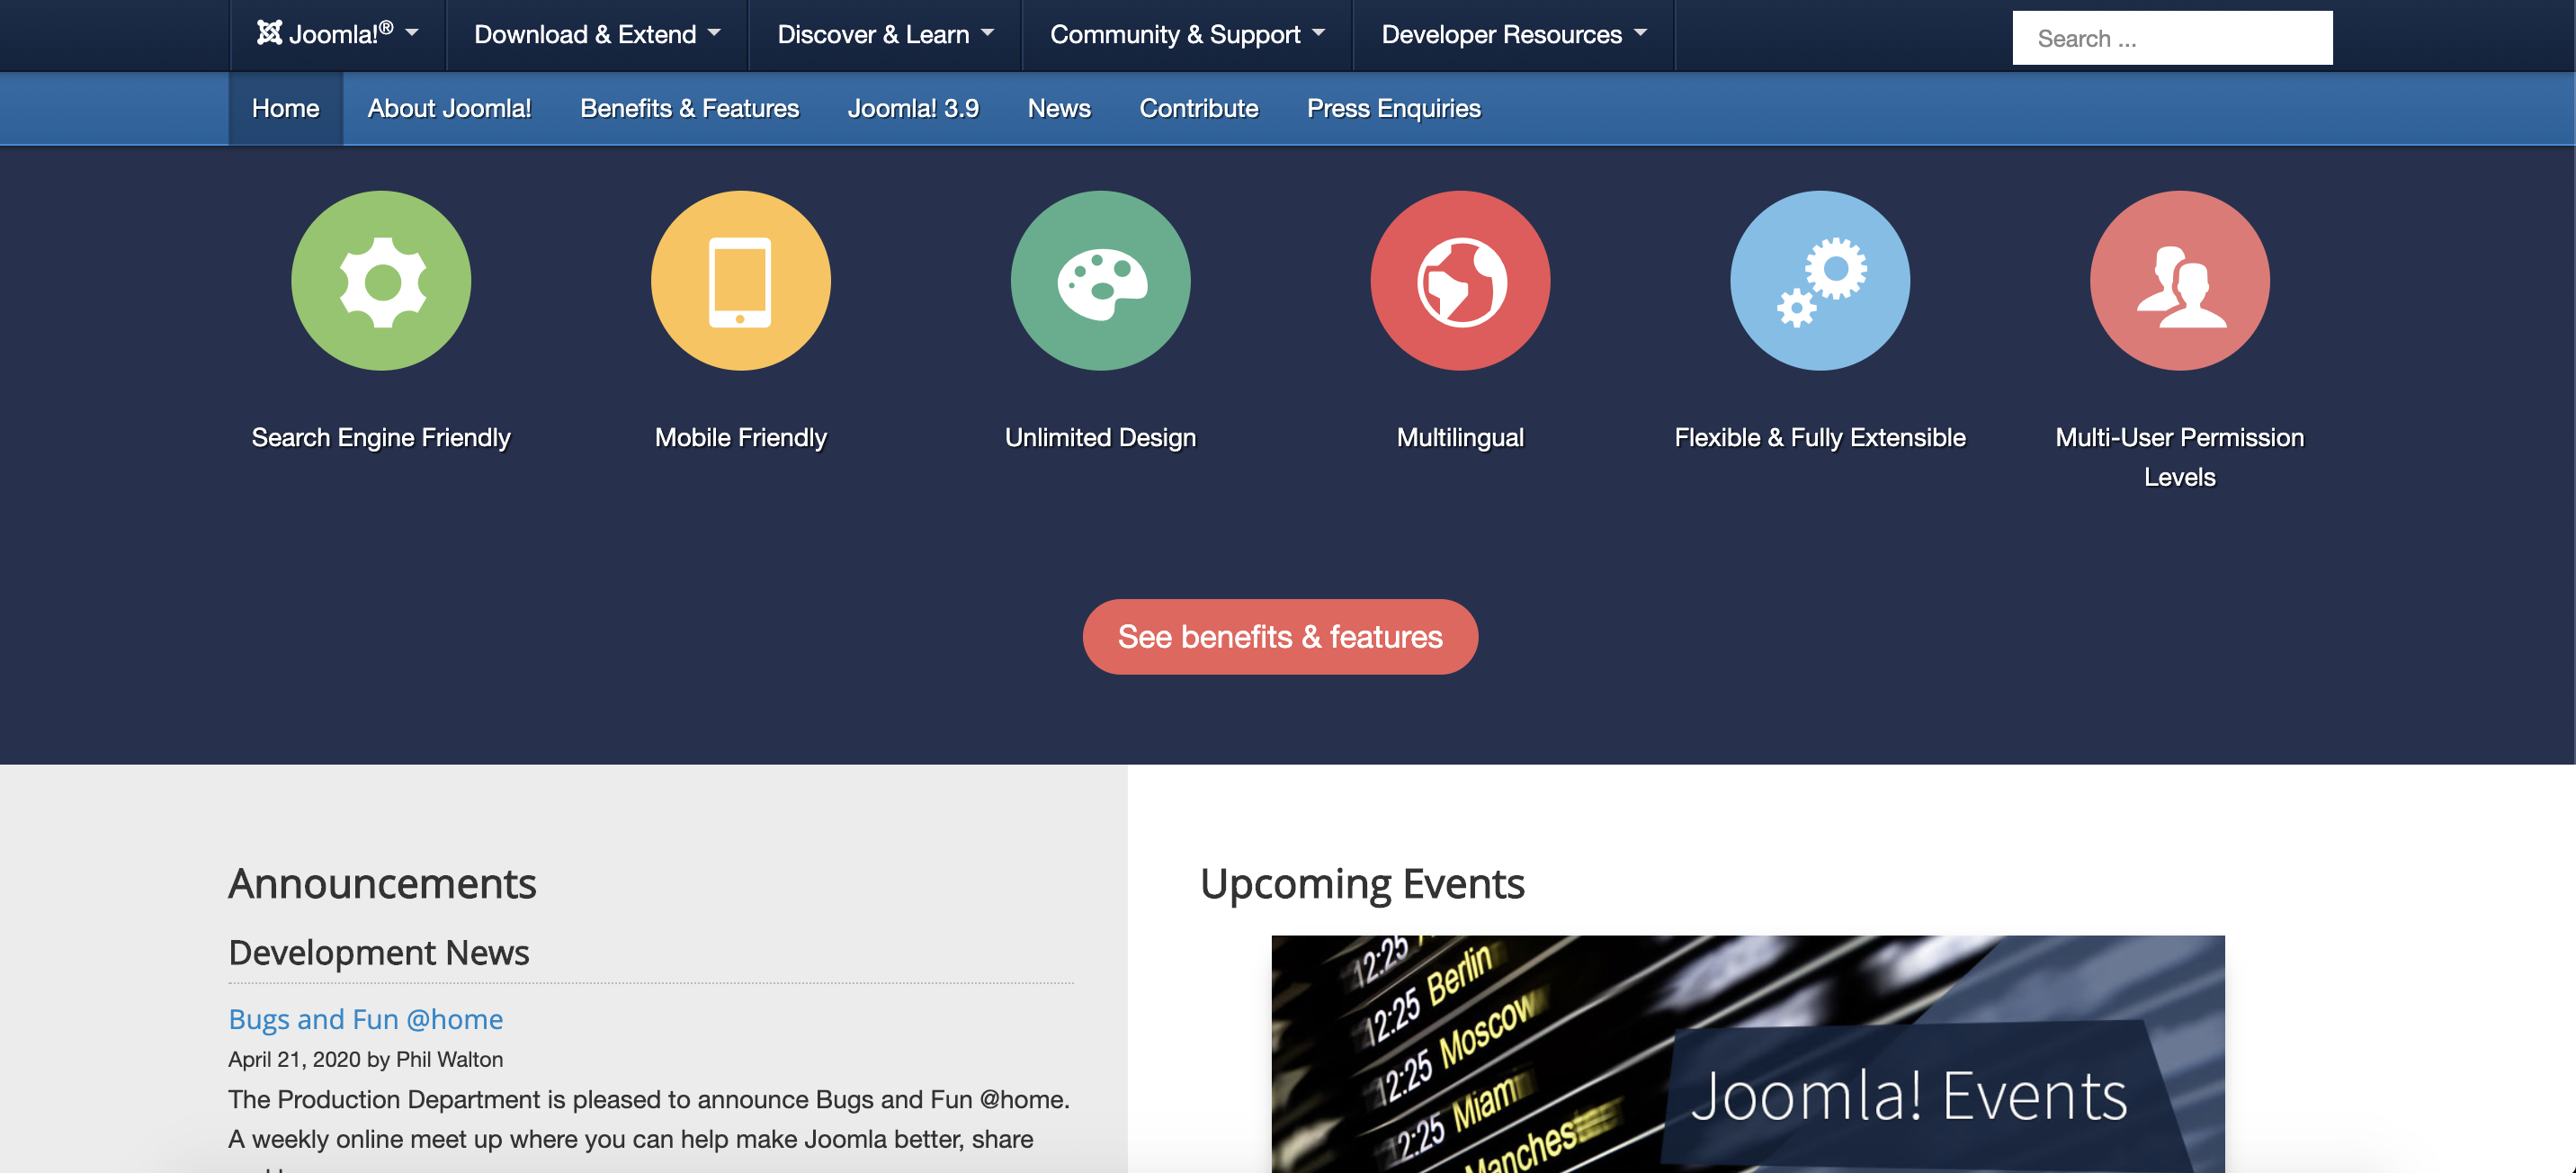 joomla content management system